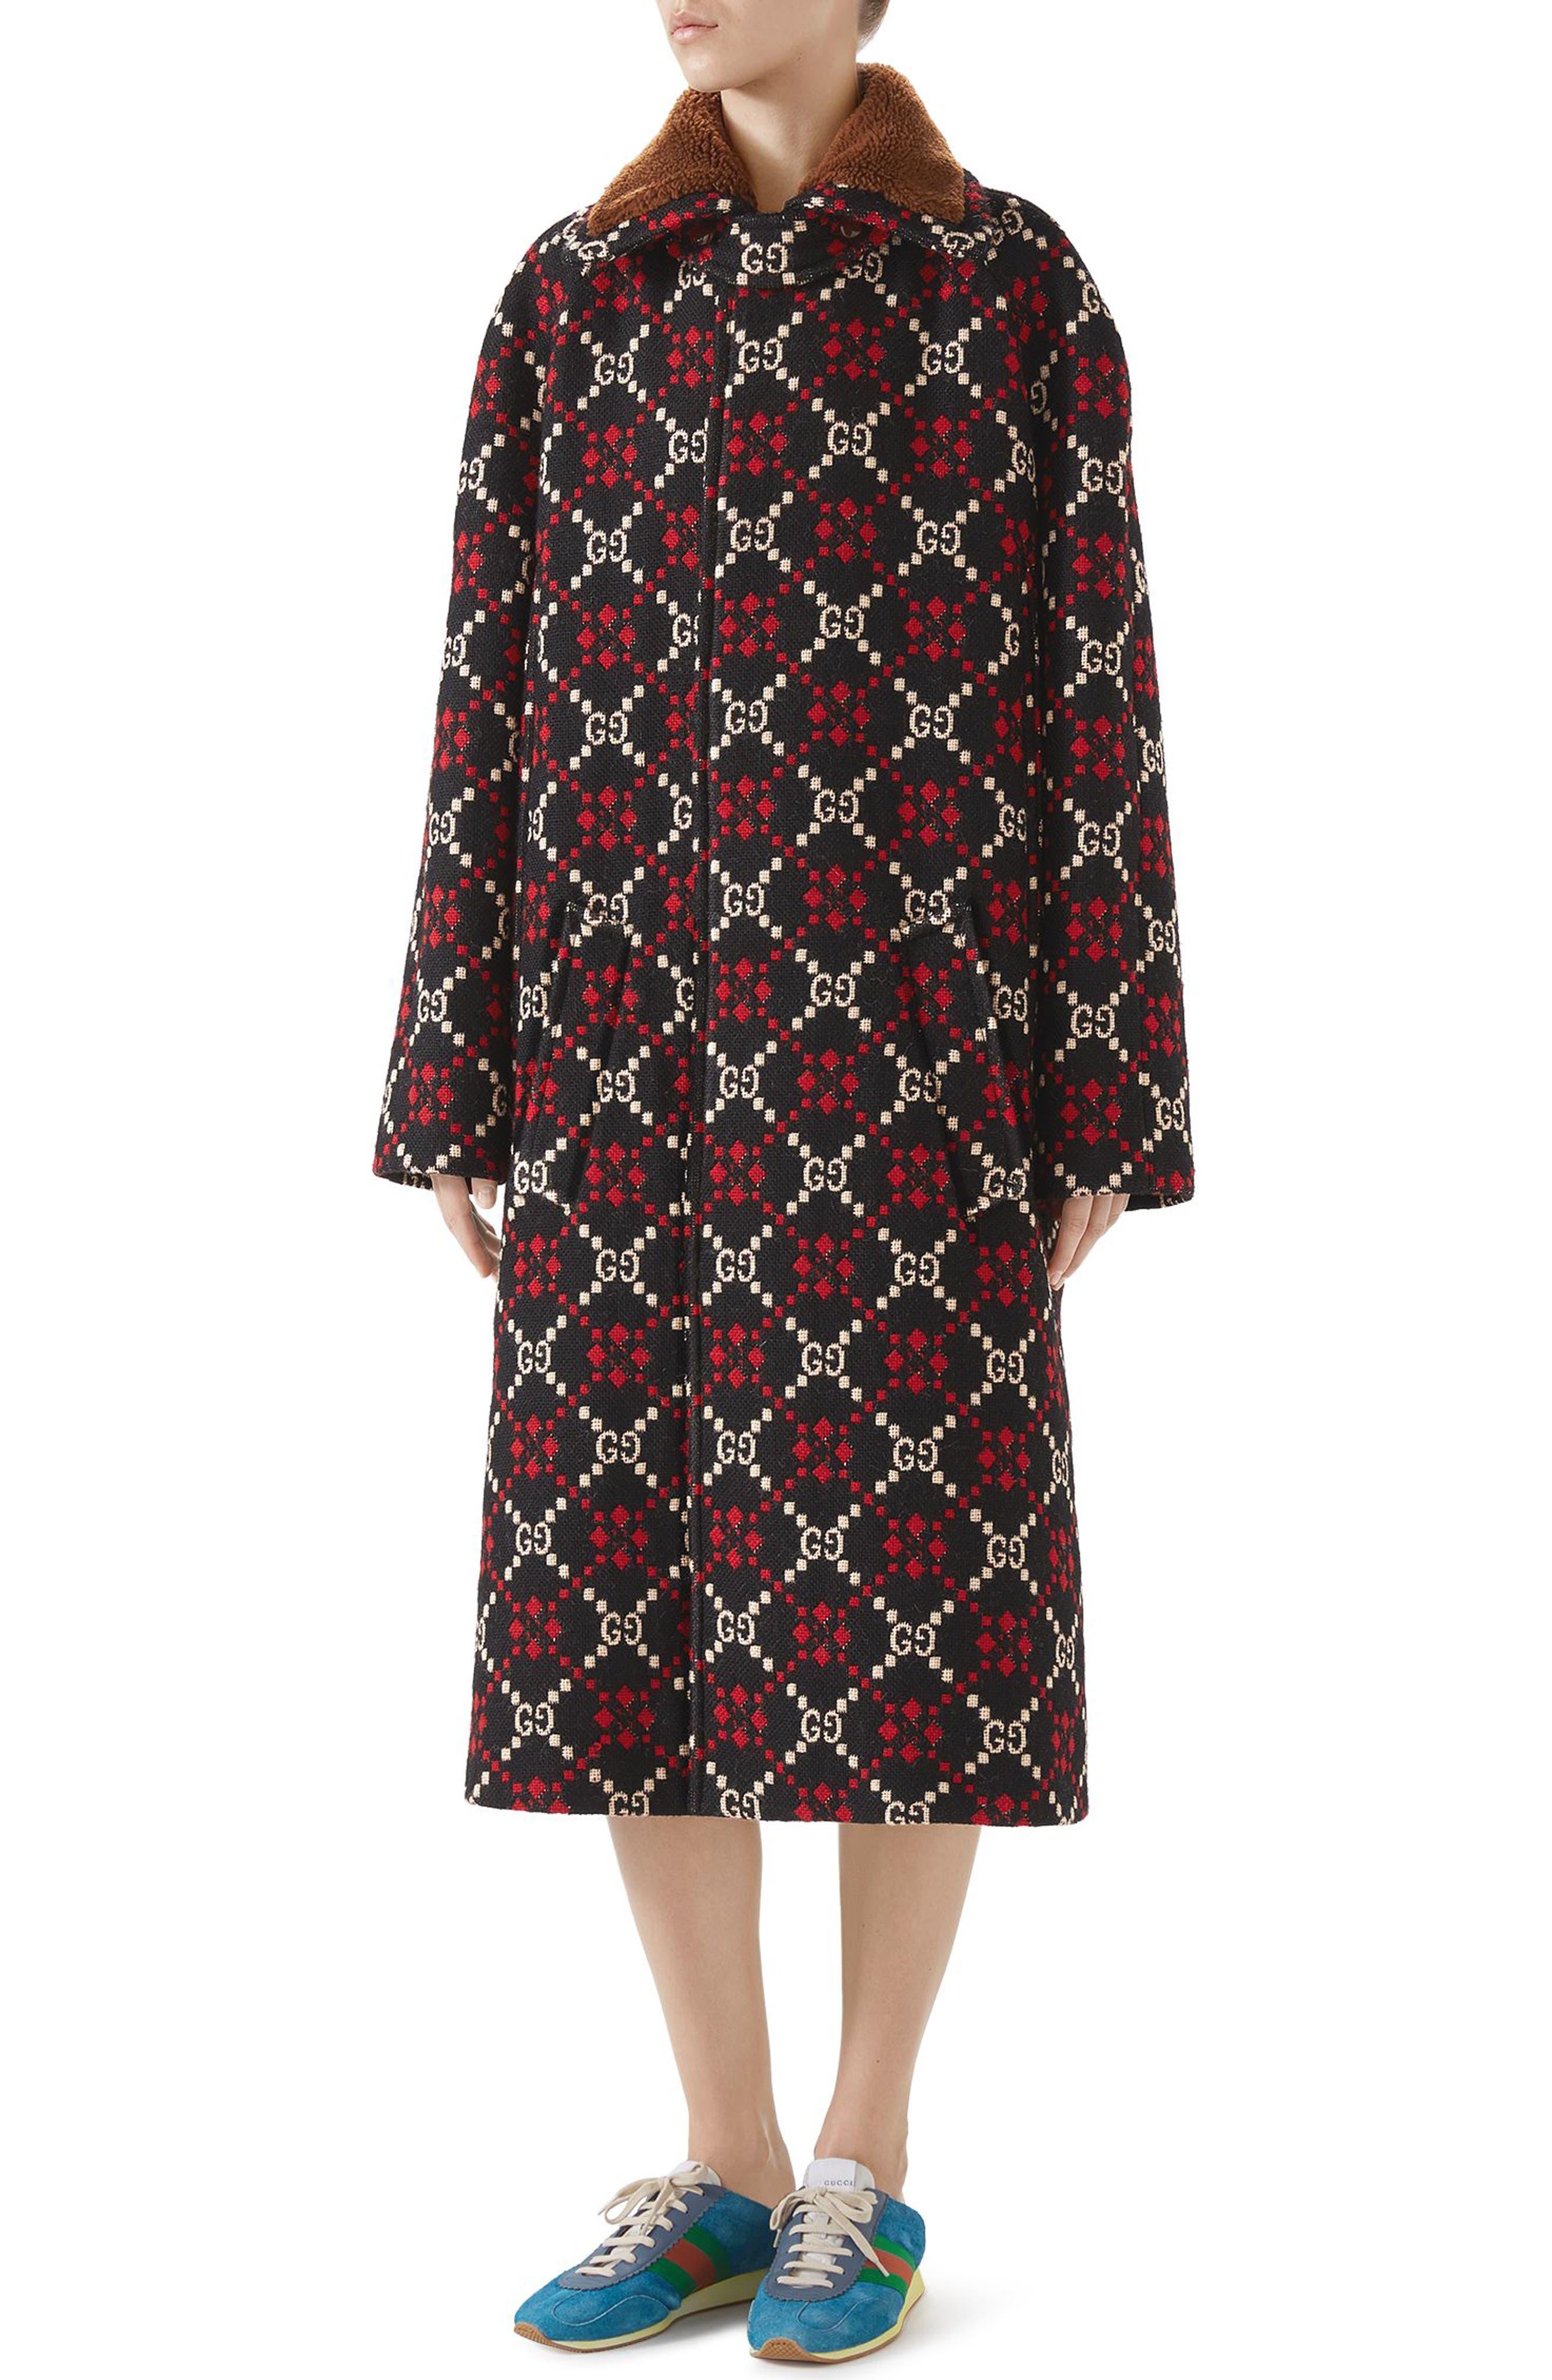 Vintage Coats & Jackets | Retro Coats and Jackets Womens Gucci Gg Logo Jacquard Cape Coat Size 4 US  40 IT - Black $4,980.00 AT vintagedancer.com